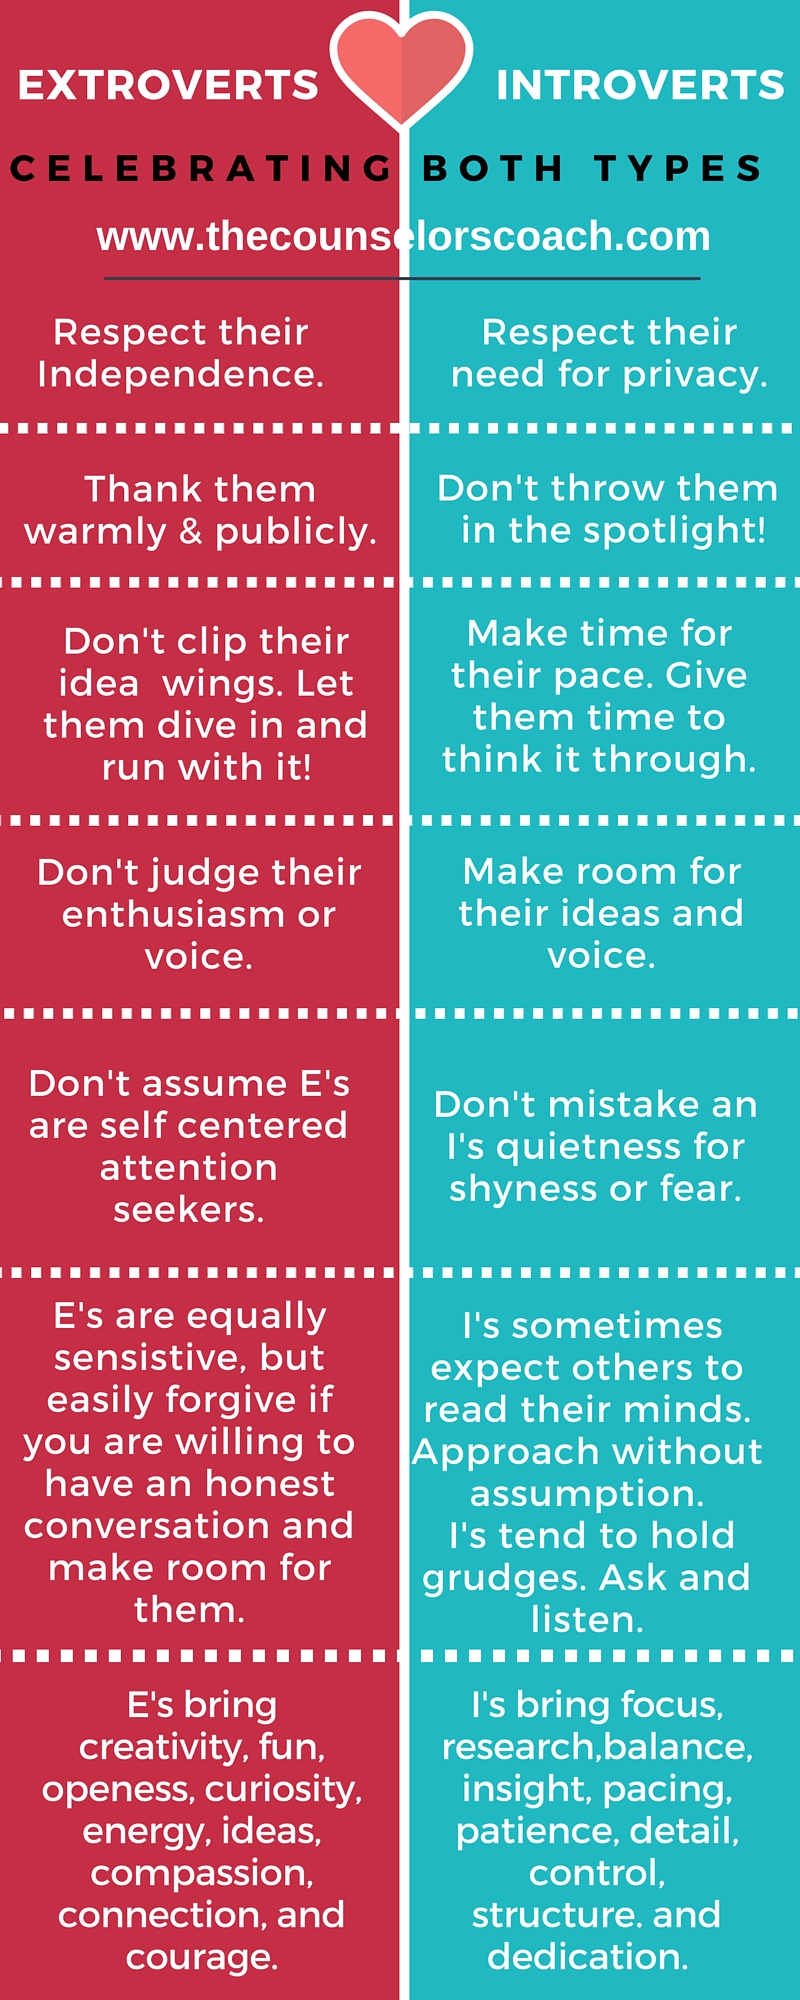 extrovert-introvert-infographic.jpg